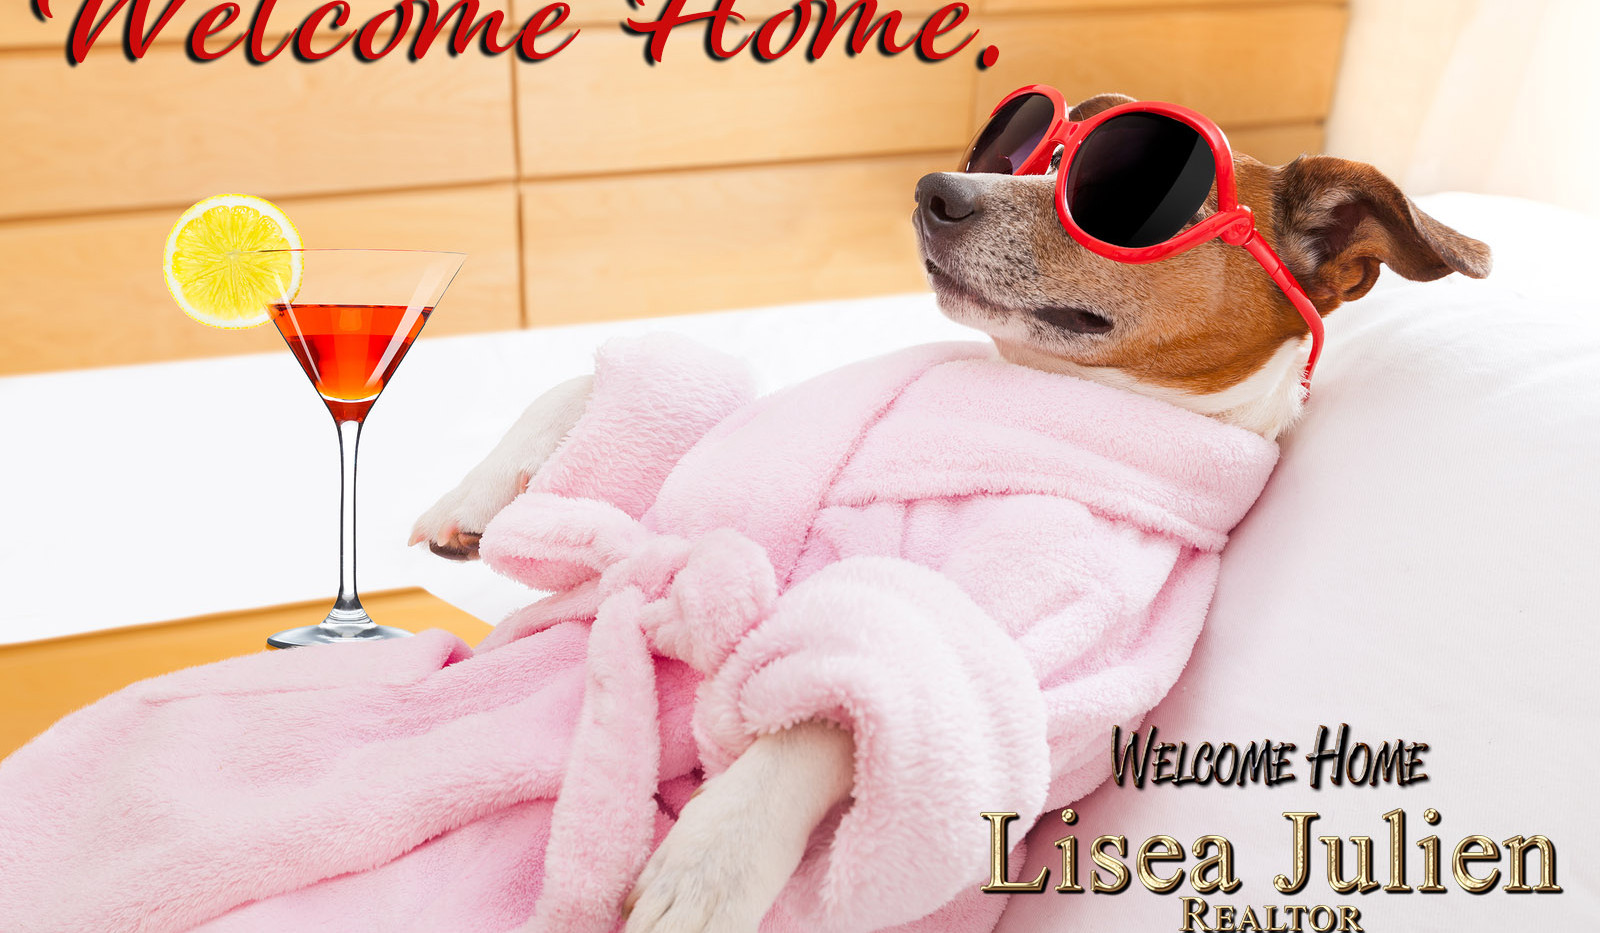 bigstock-Dog-Spa-Wellness-94814387.jpg